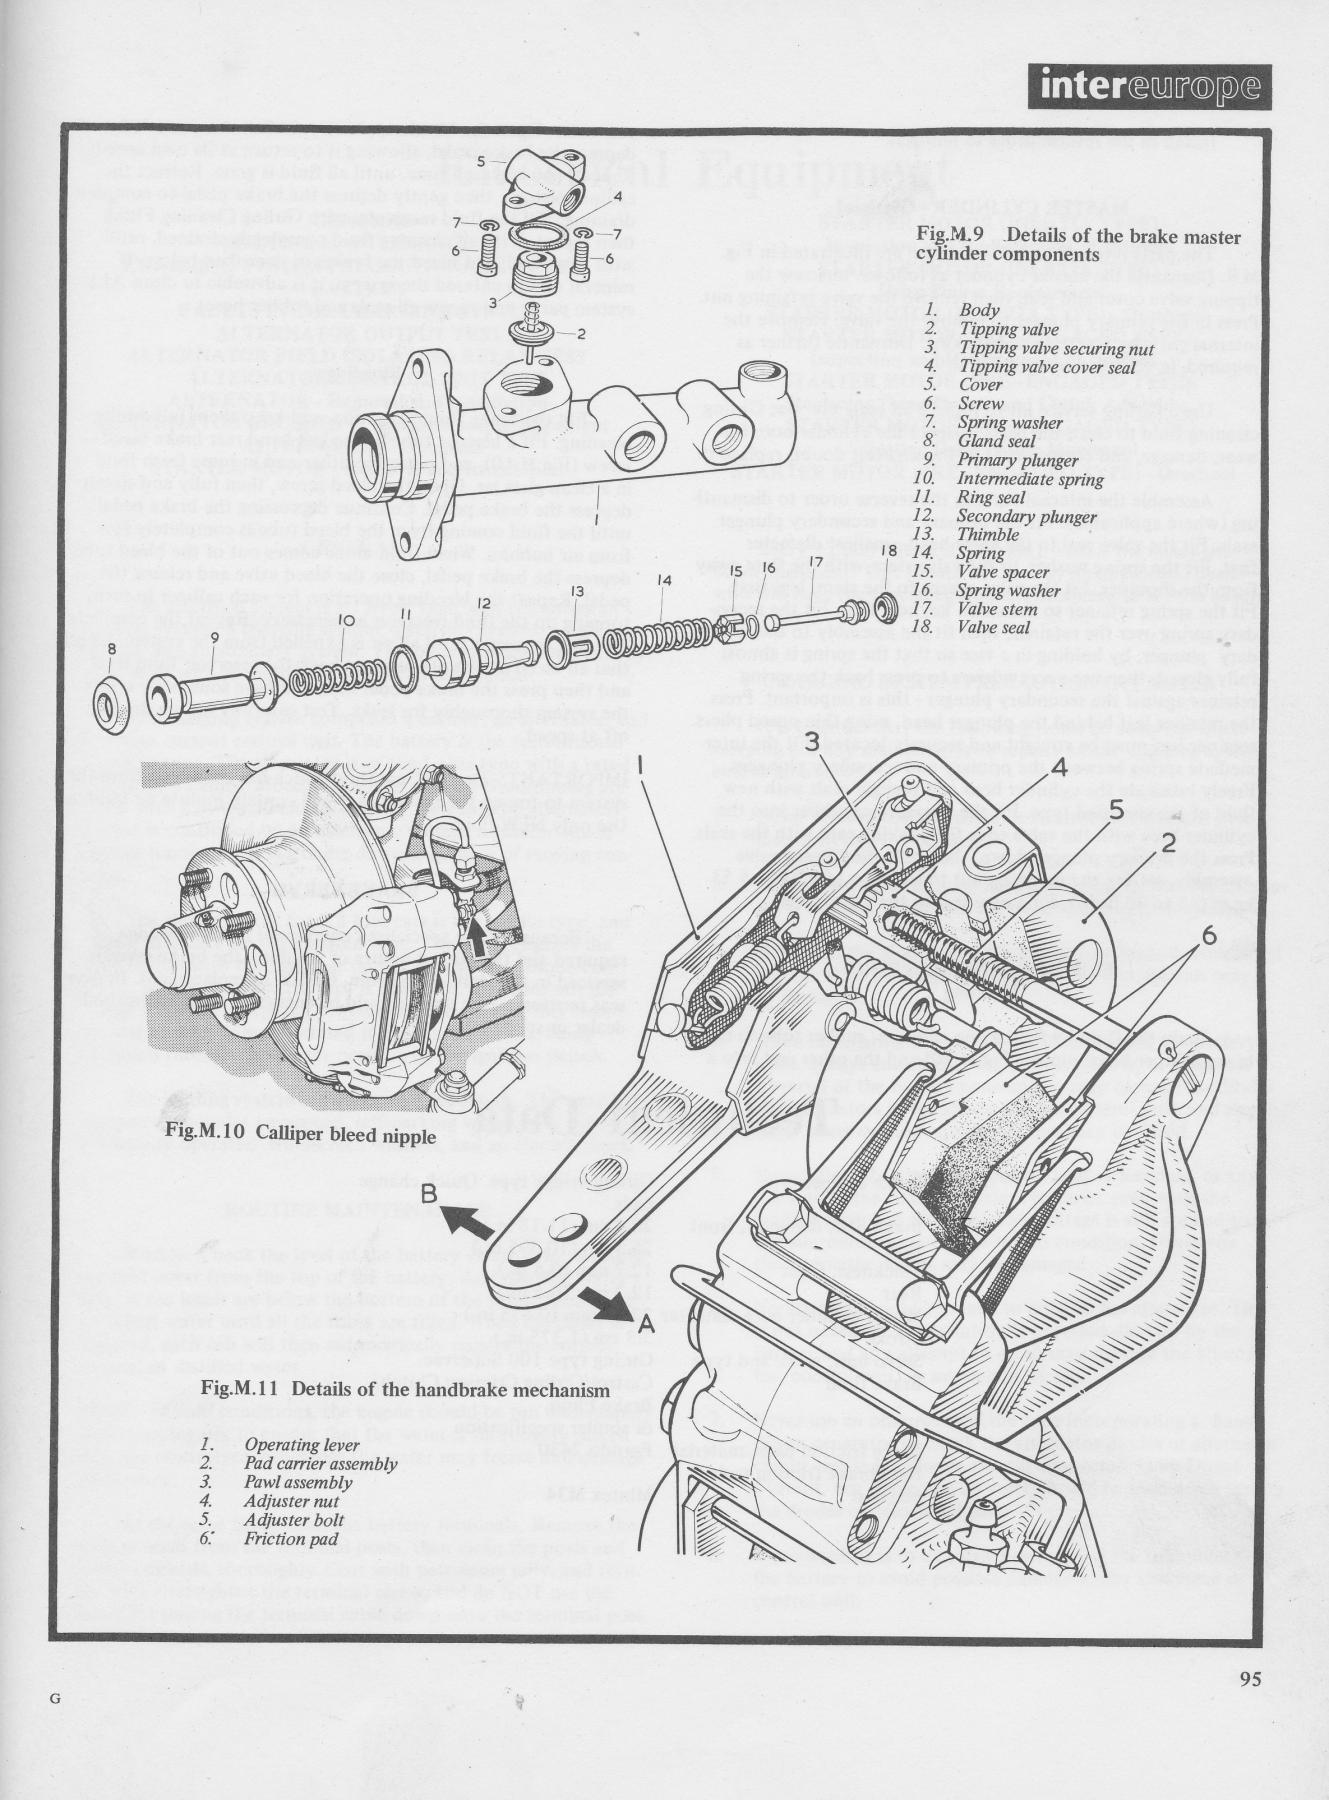 Xj6 Brakes Handbrake